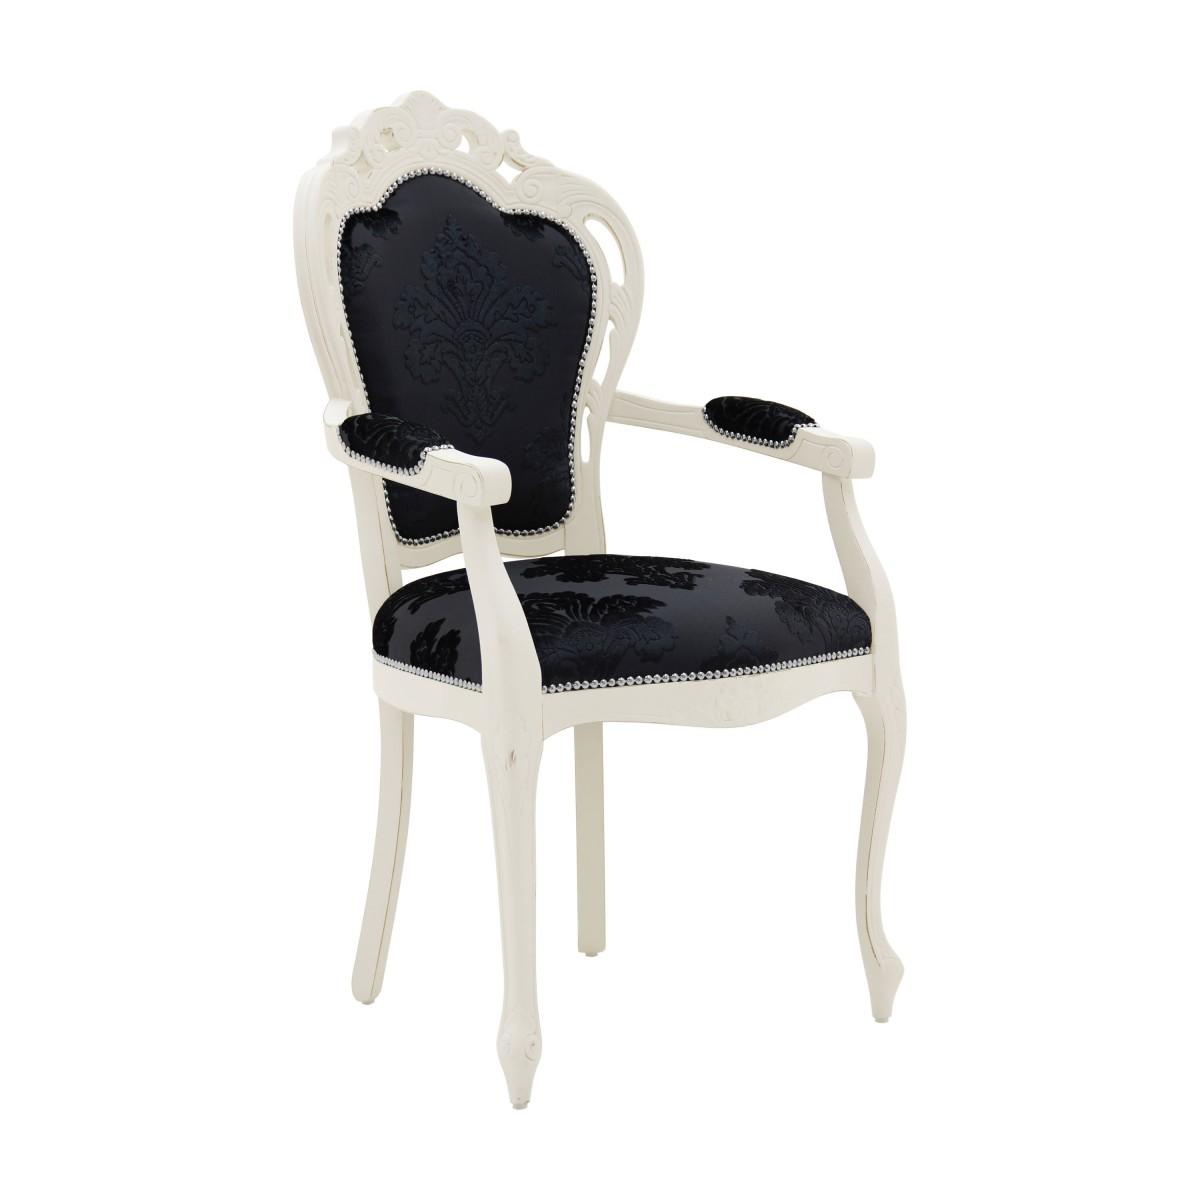 replica armchair traforata 4708